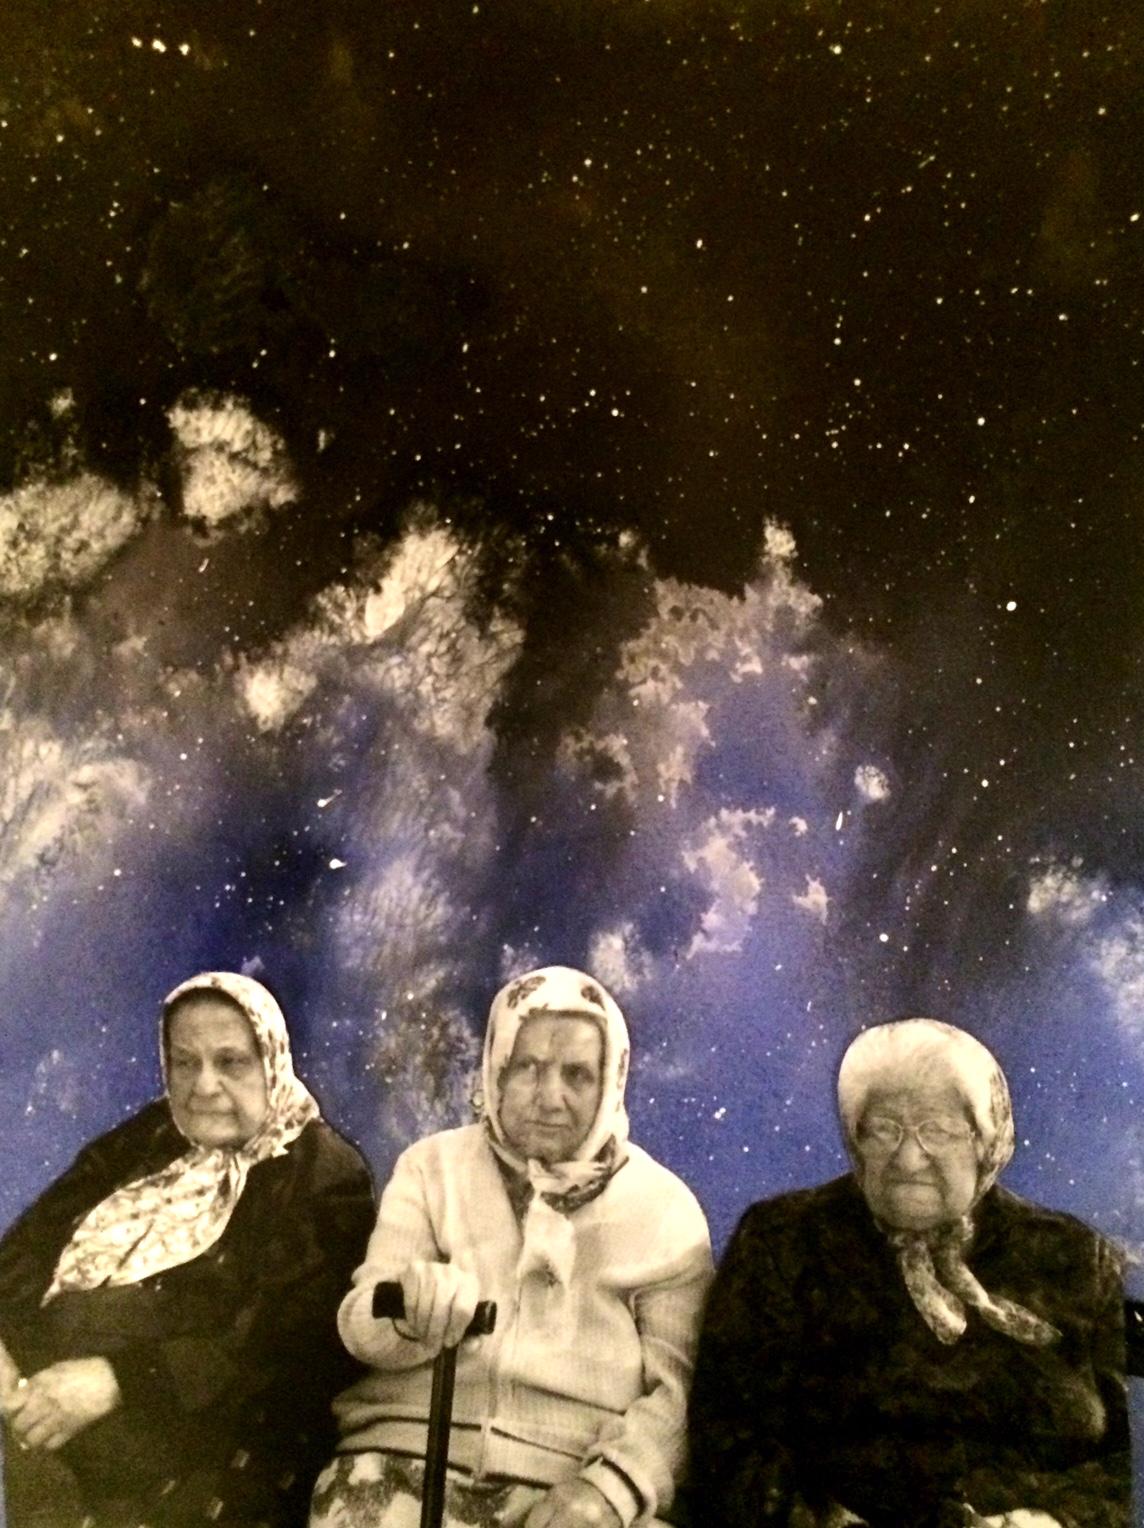 Space grannies